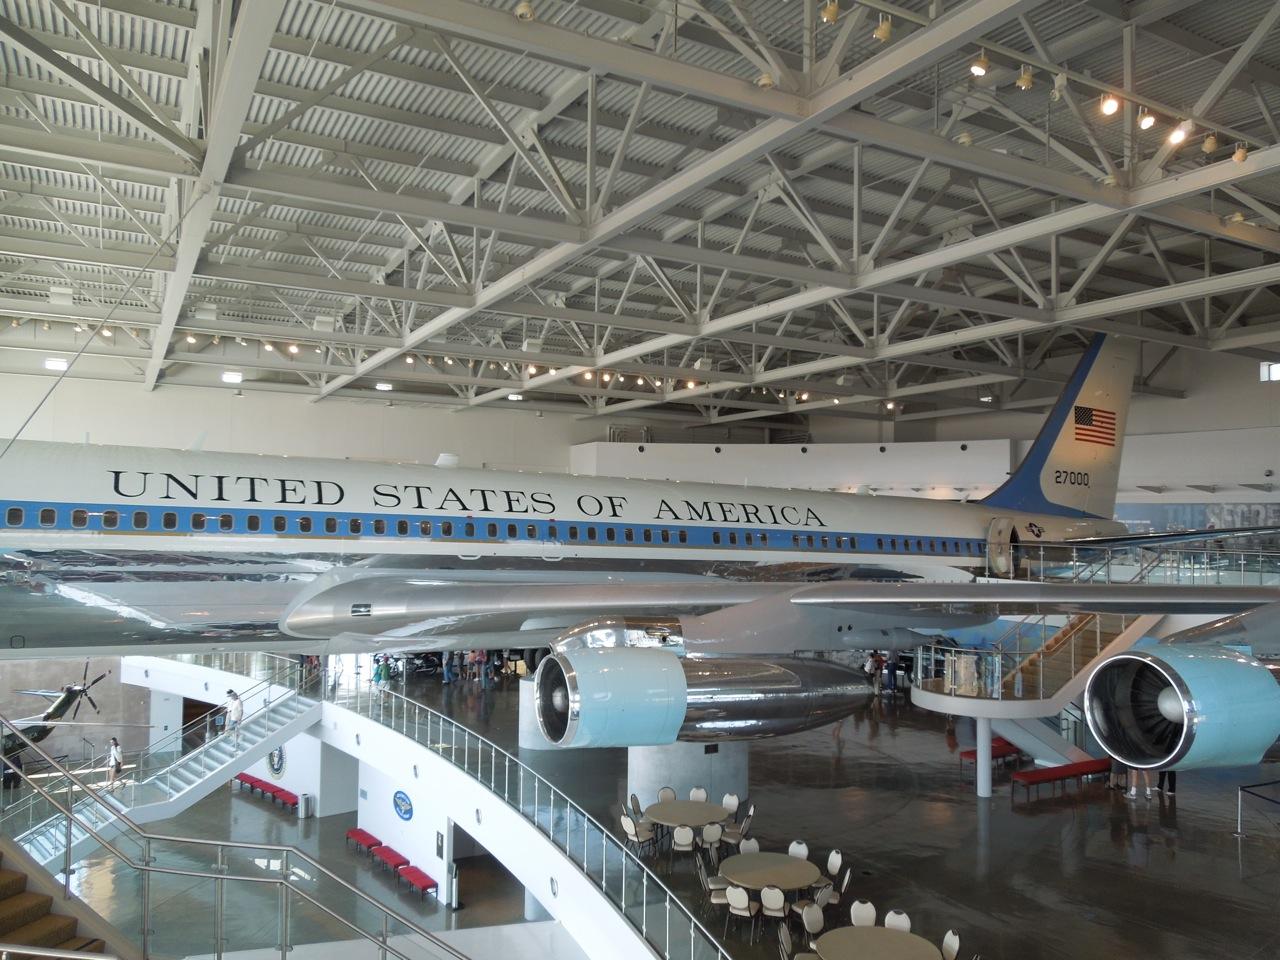 Air Force 1 Plane Obama Inside Images